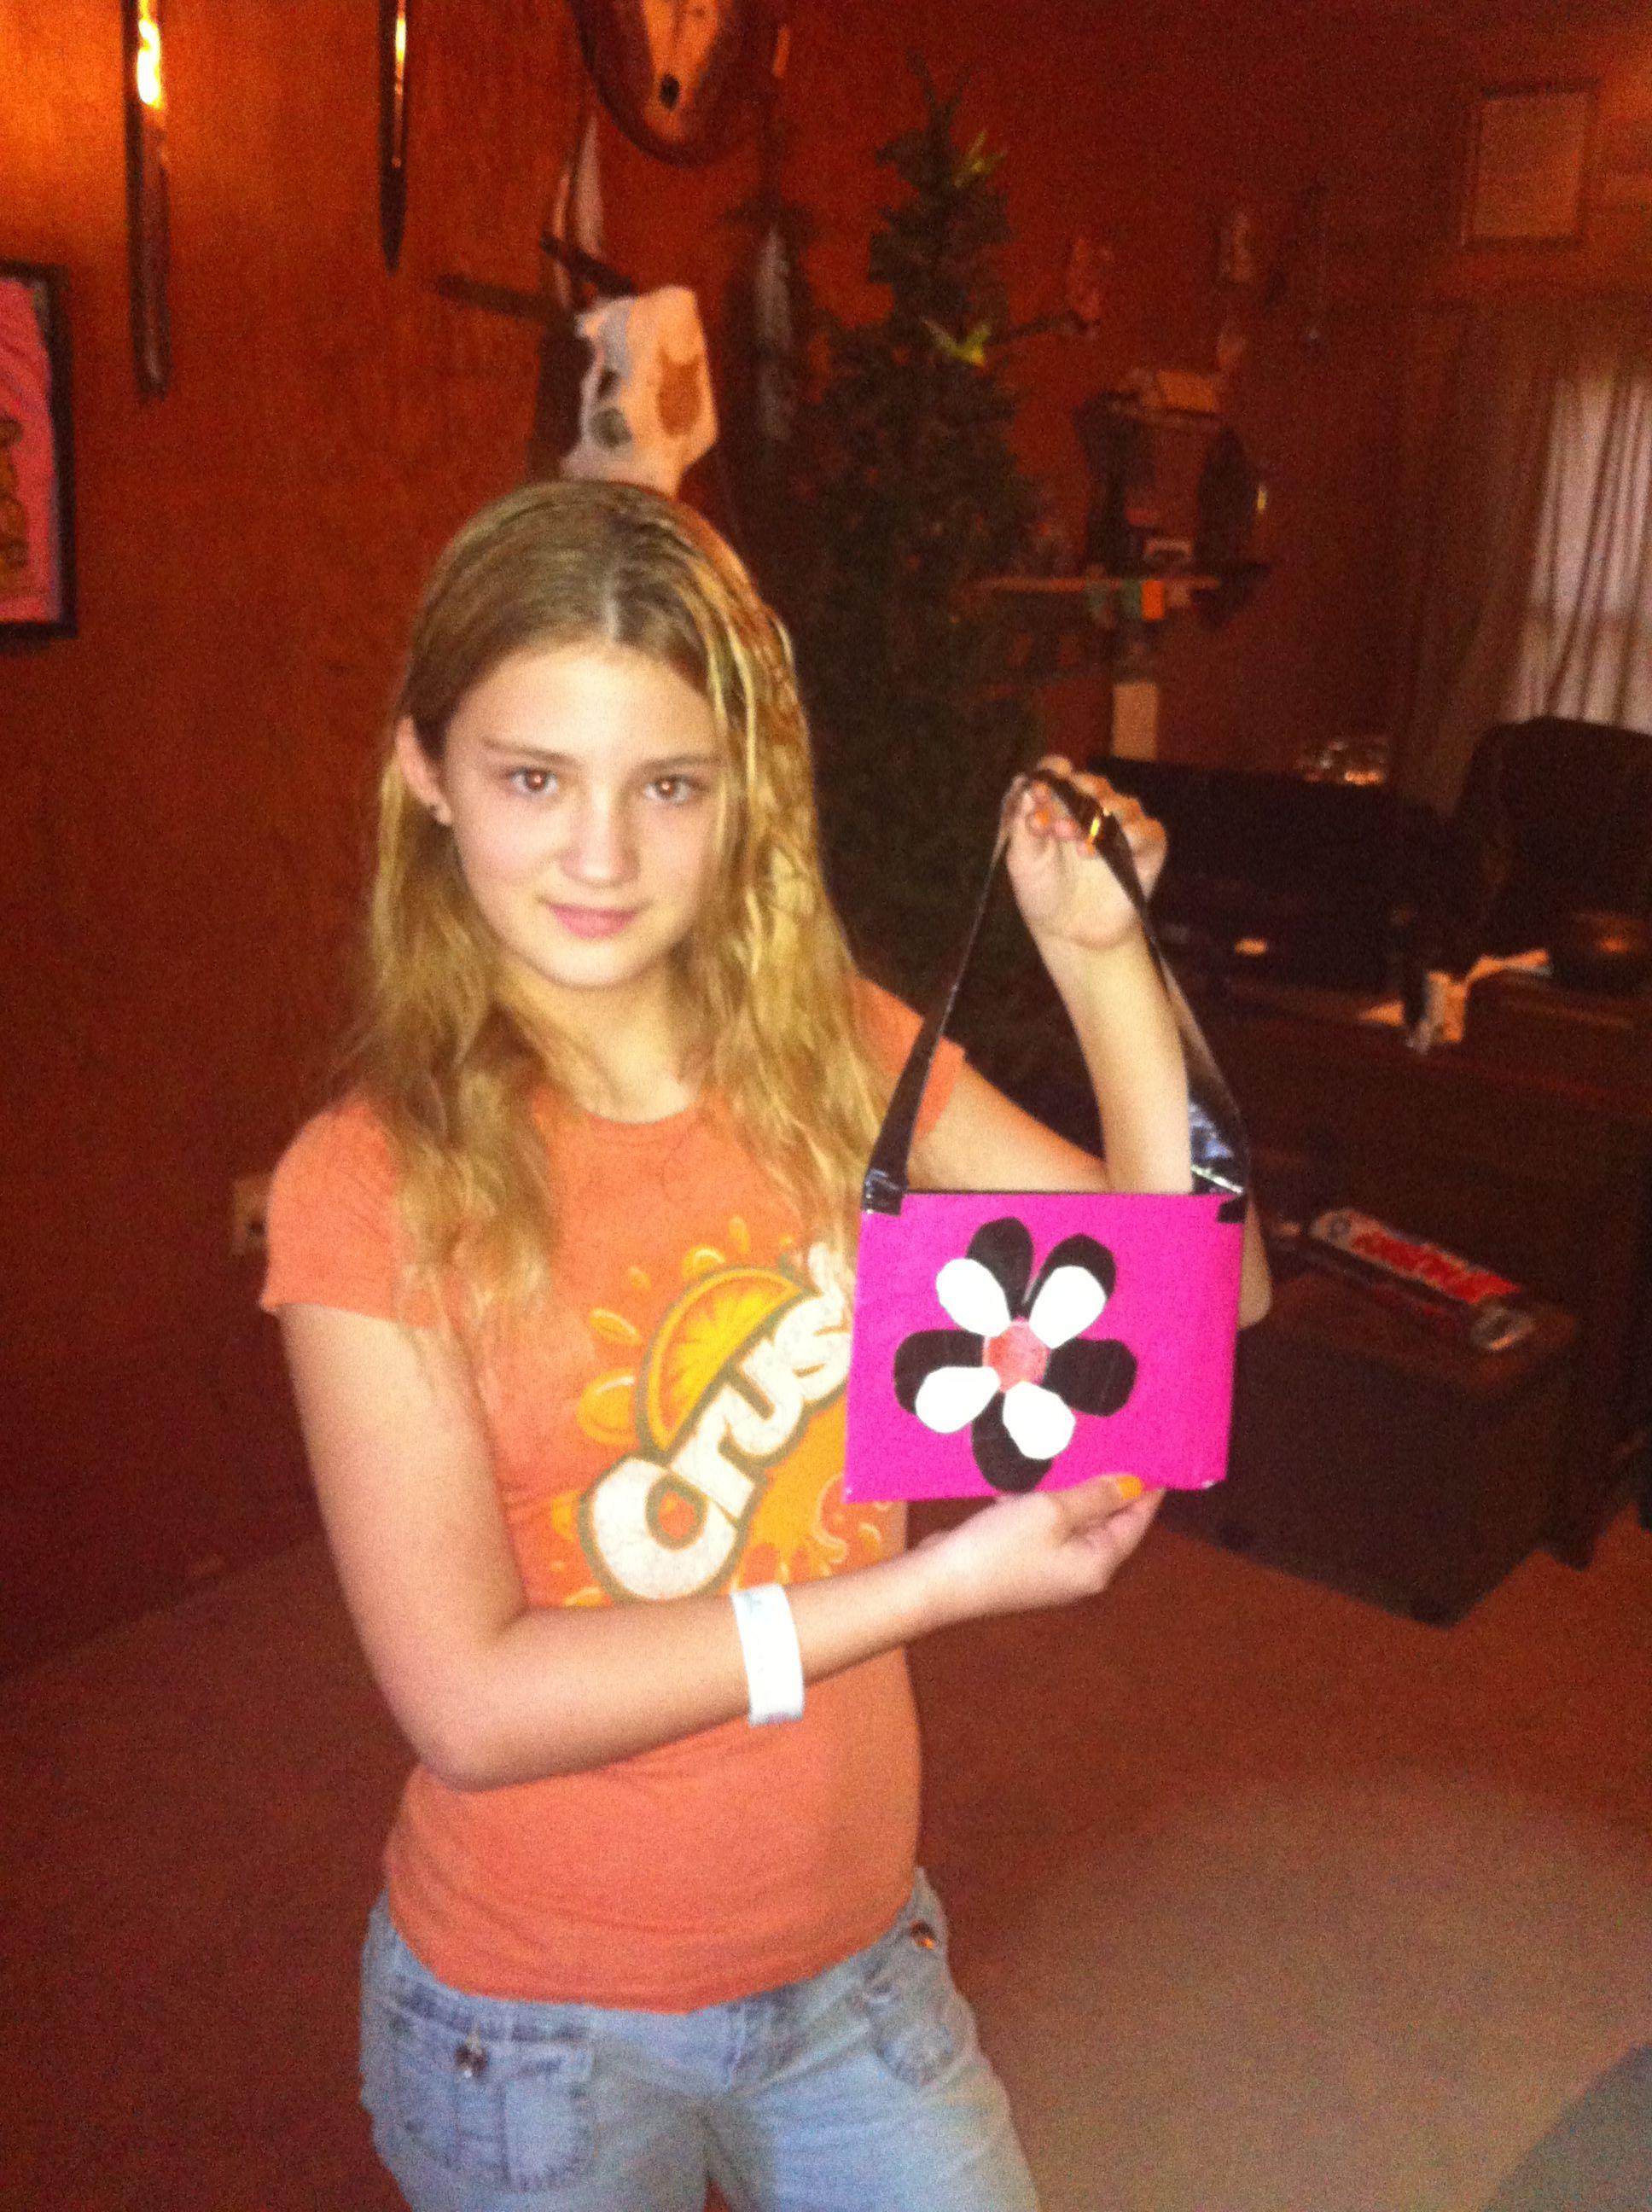 Erin's duct tape purse